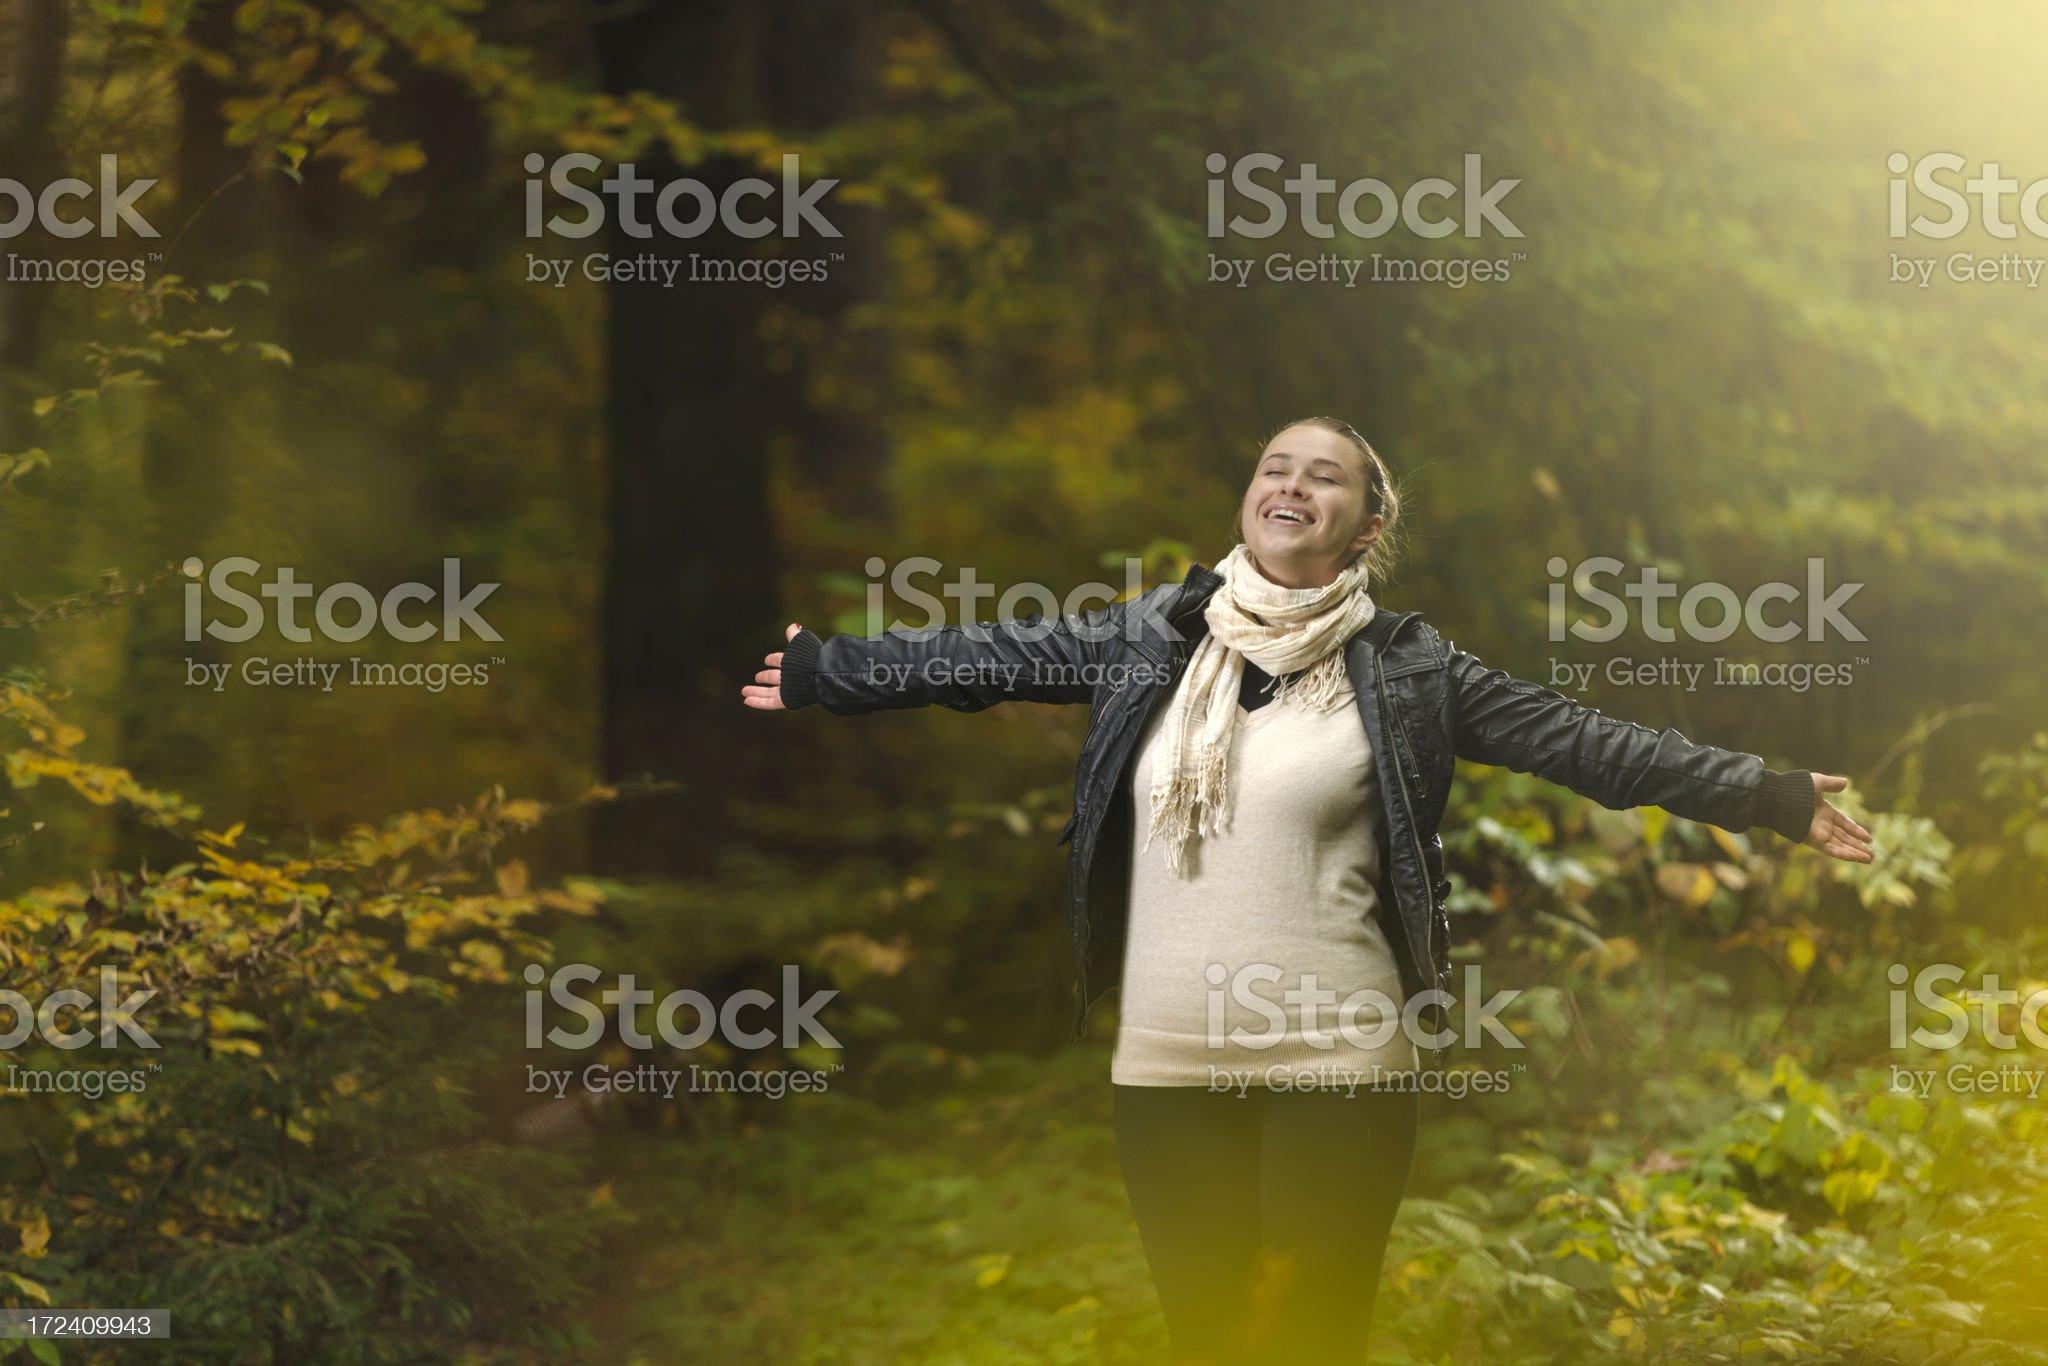 freedom and joy royalty-free stock photo